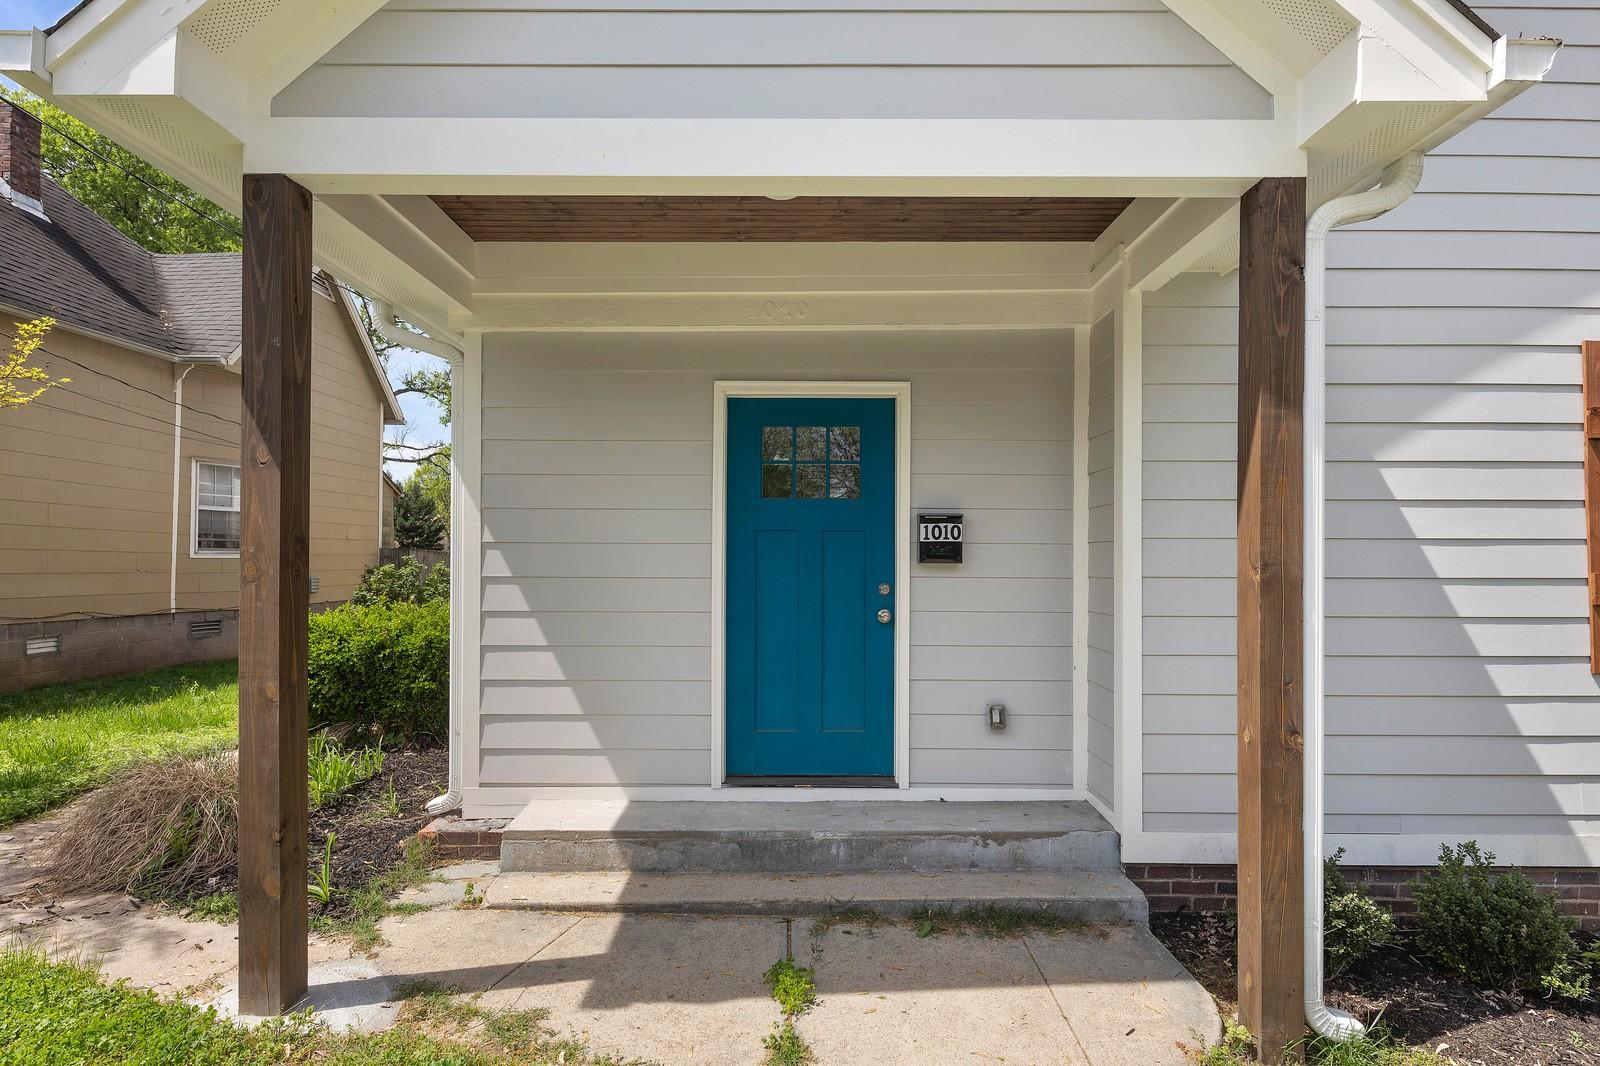 1010 Stainback Ave, Nashville, TN 37207 - Nashville, TN real estate listing